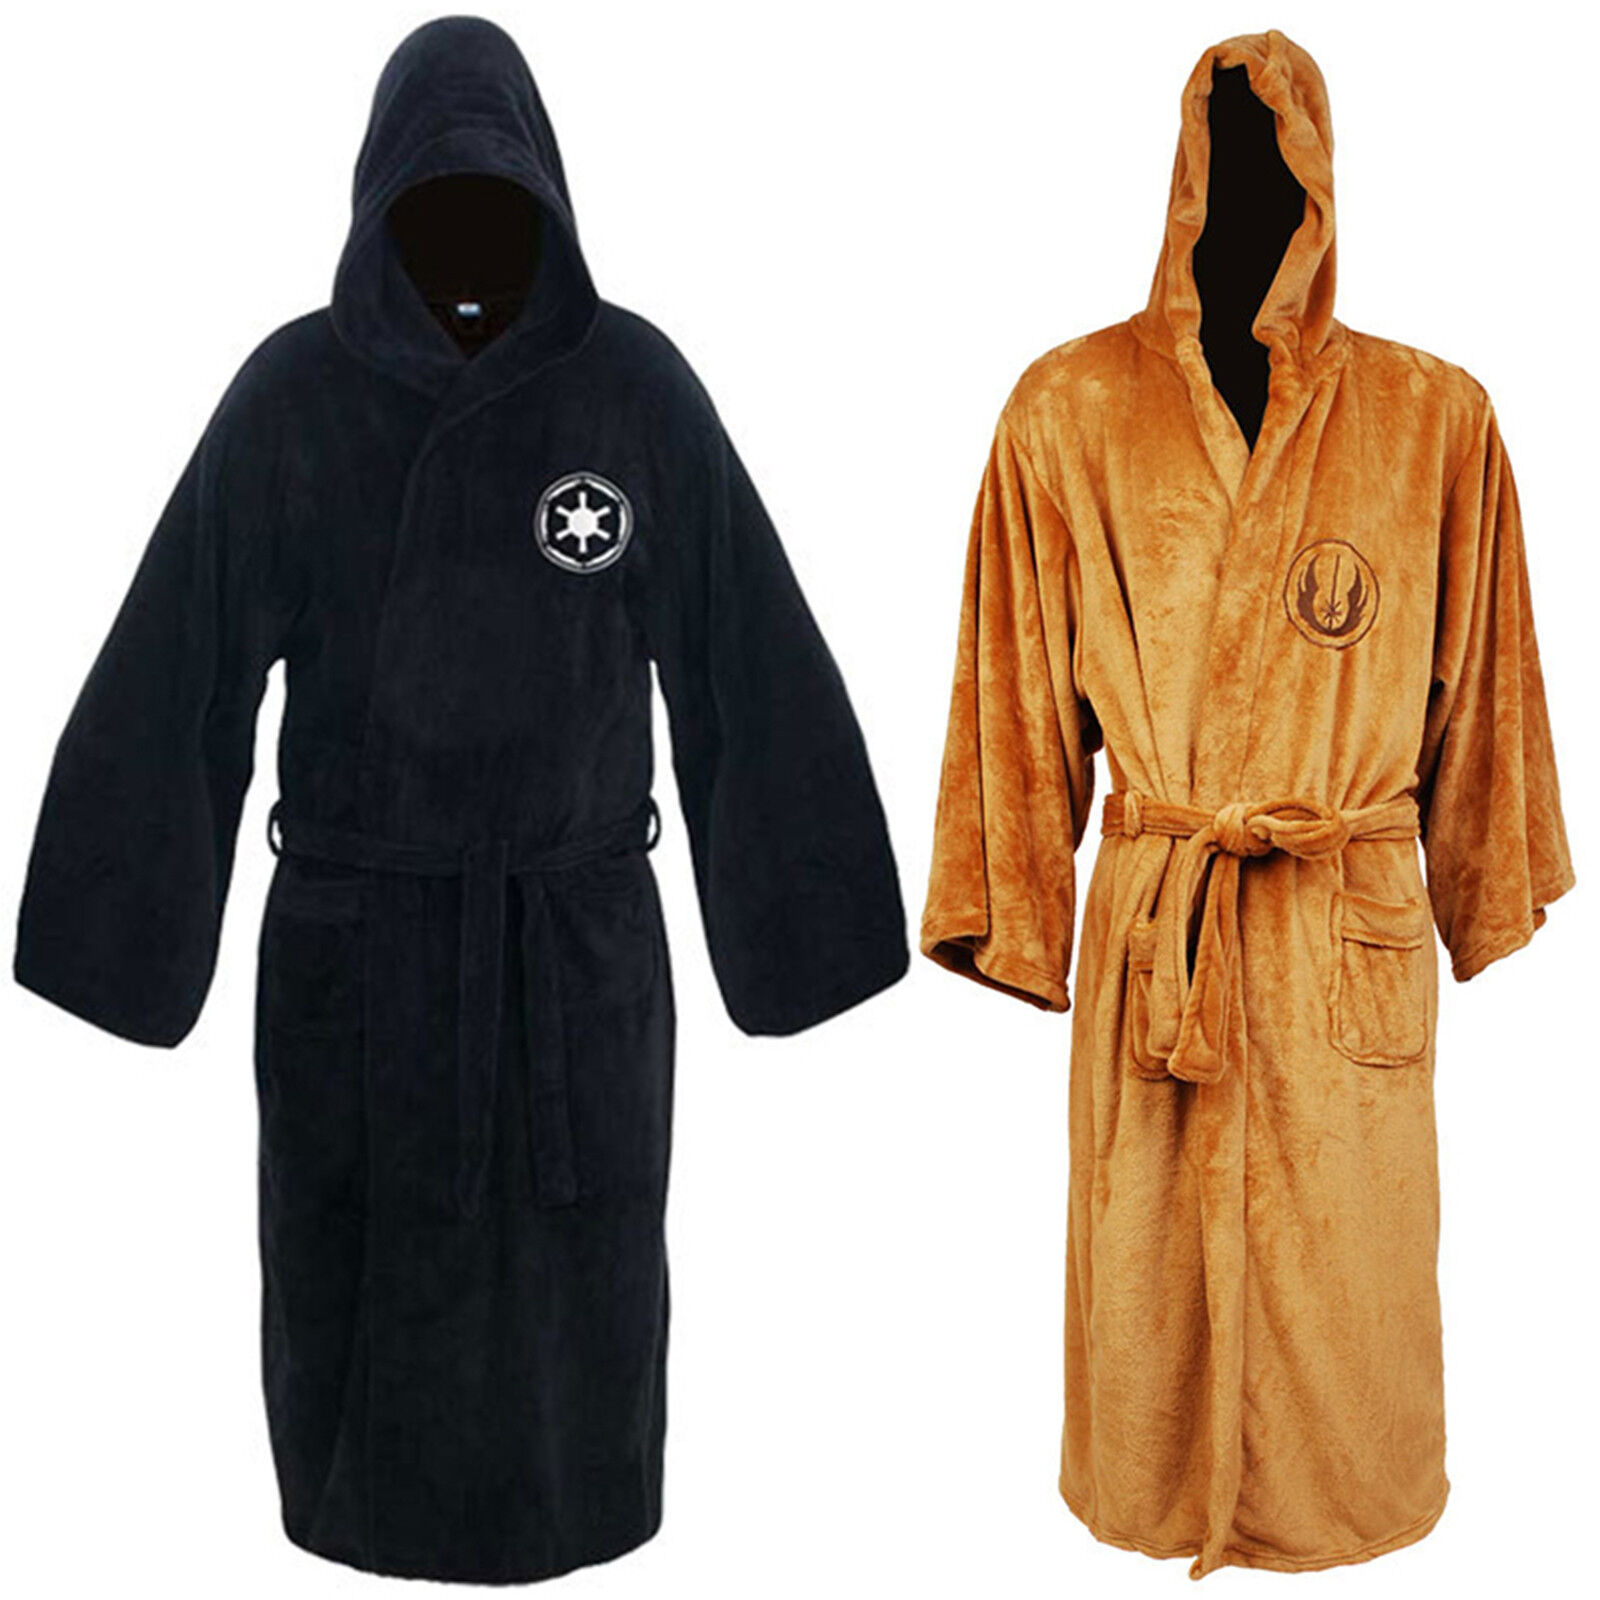 17b8e62314 Mens Hooded Bathrobe Turkish Cotton Terry Spa Robe With Hood Men Star War  bath